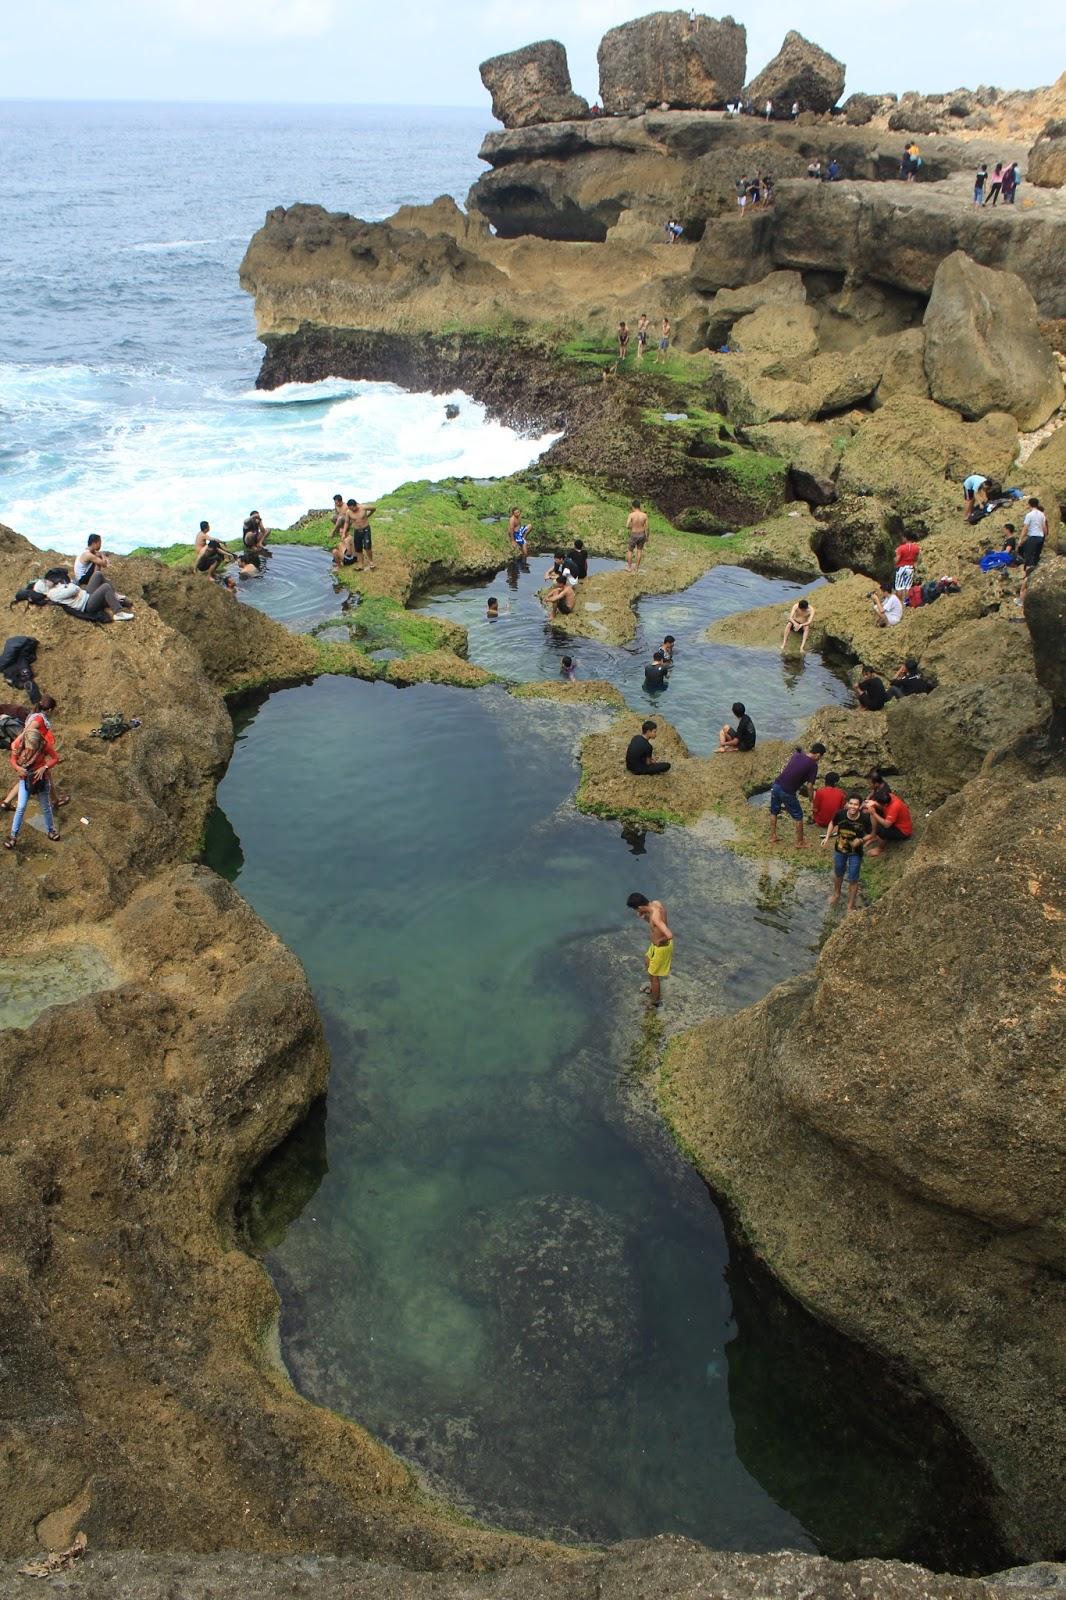 Pantai Kedung Celeng Travelresources Ferdy Waterfall Tumpang Kota Malang